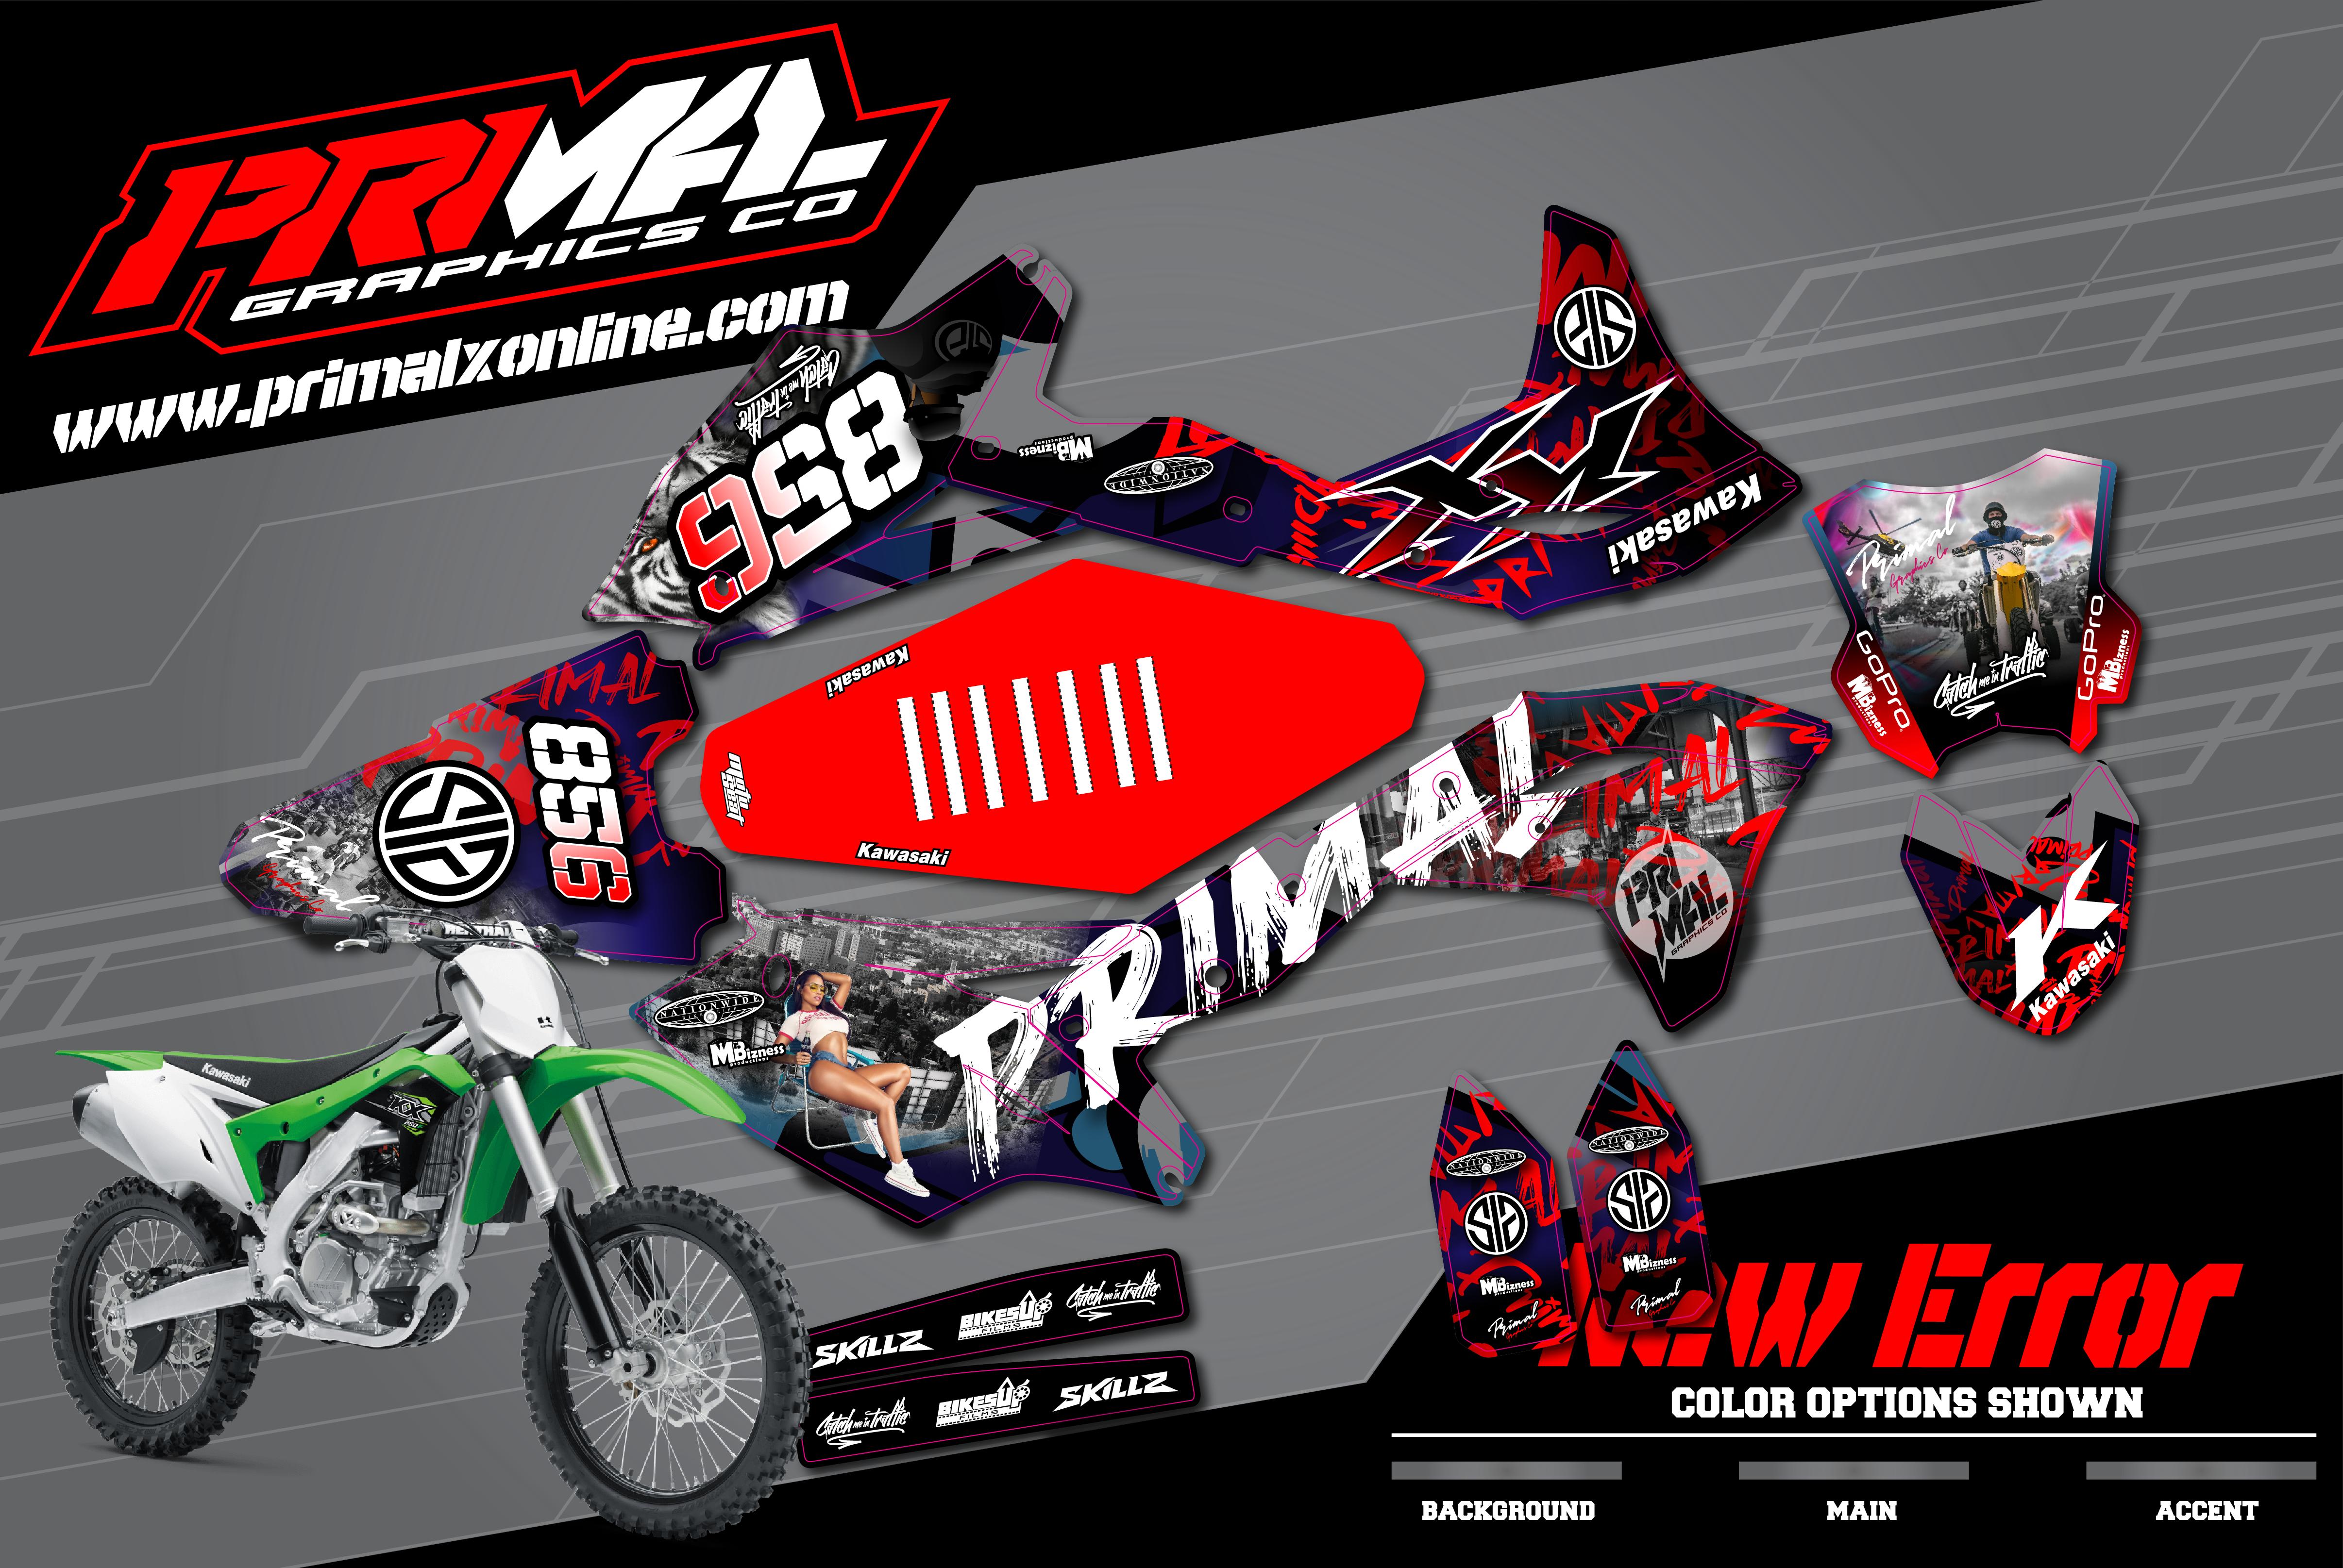 1_PRIMAL-X-MOTORSPORTS-PRIMAL-GRAPHICS-CO-KAWASAKI-KX450F-KX250-CHARM-CITY-KINGS-NEW-ERROR-MOTOCROSS-GRAPHICS-01